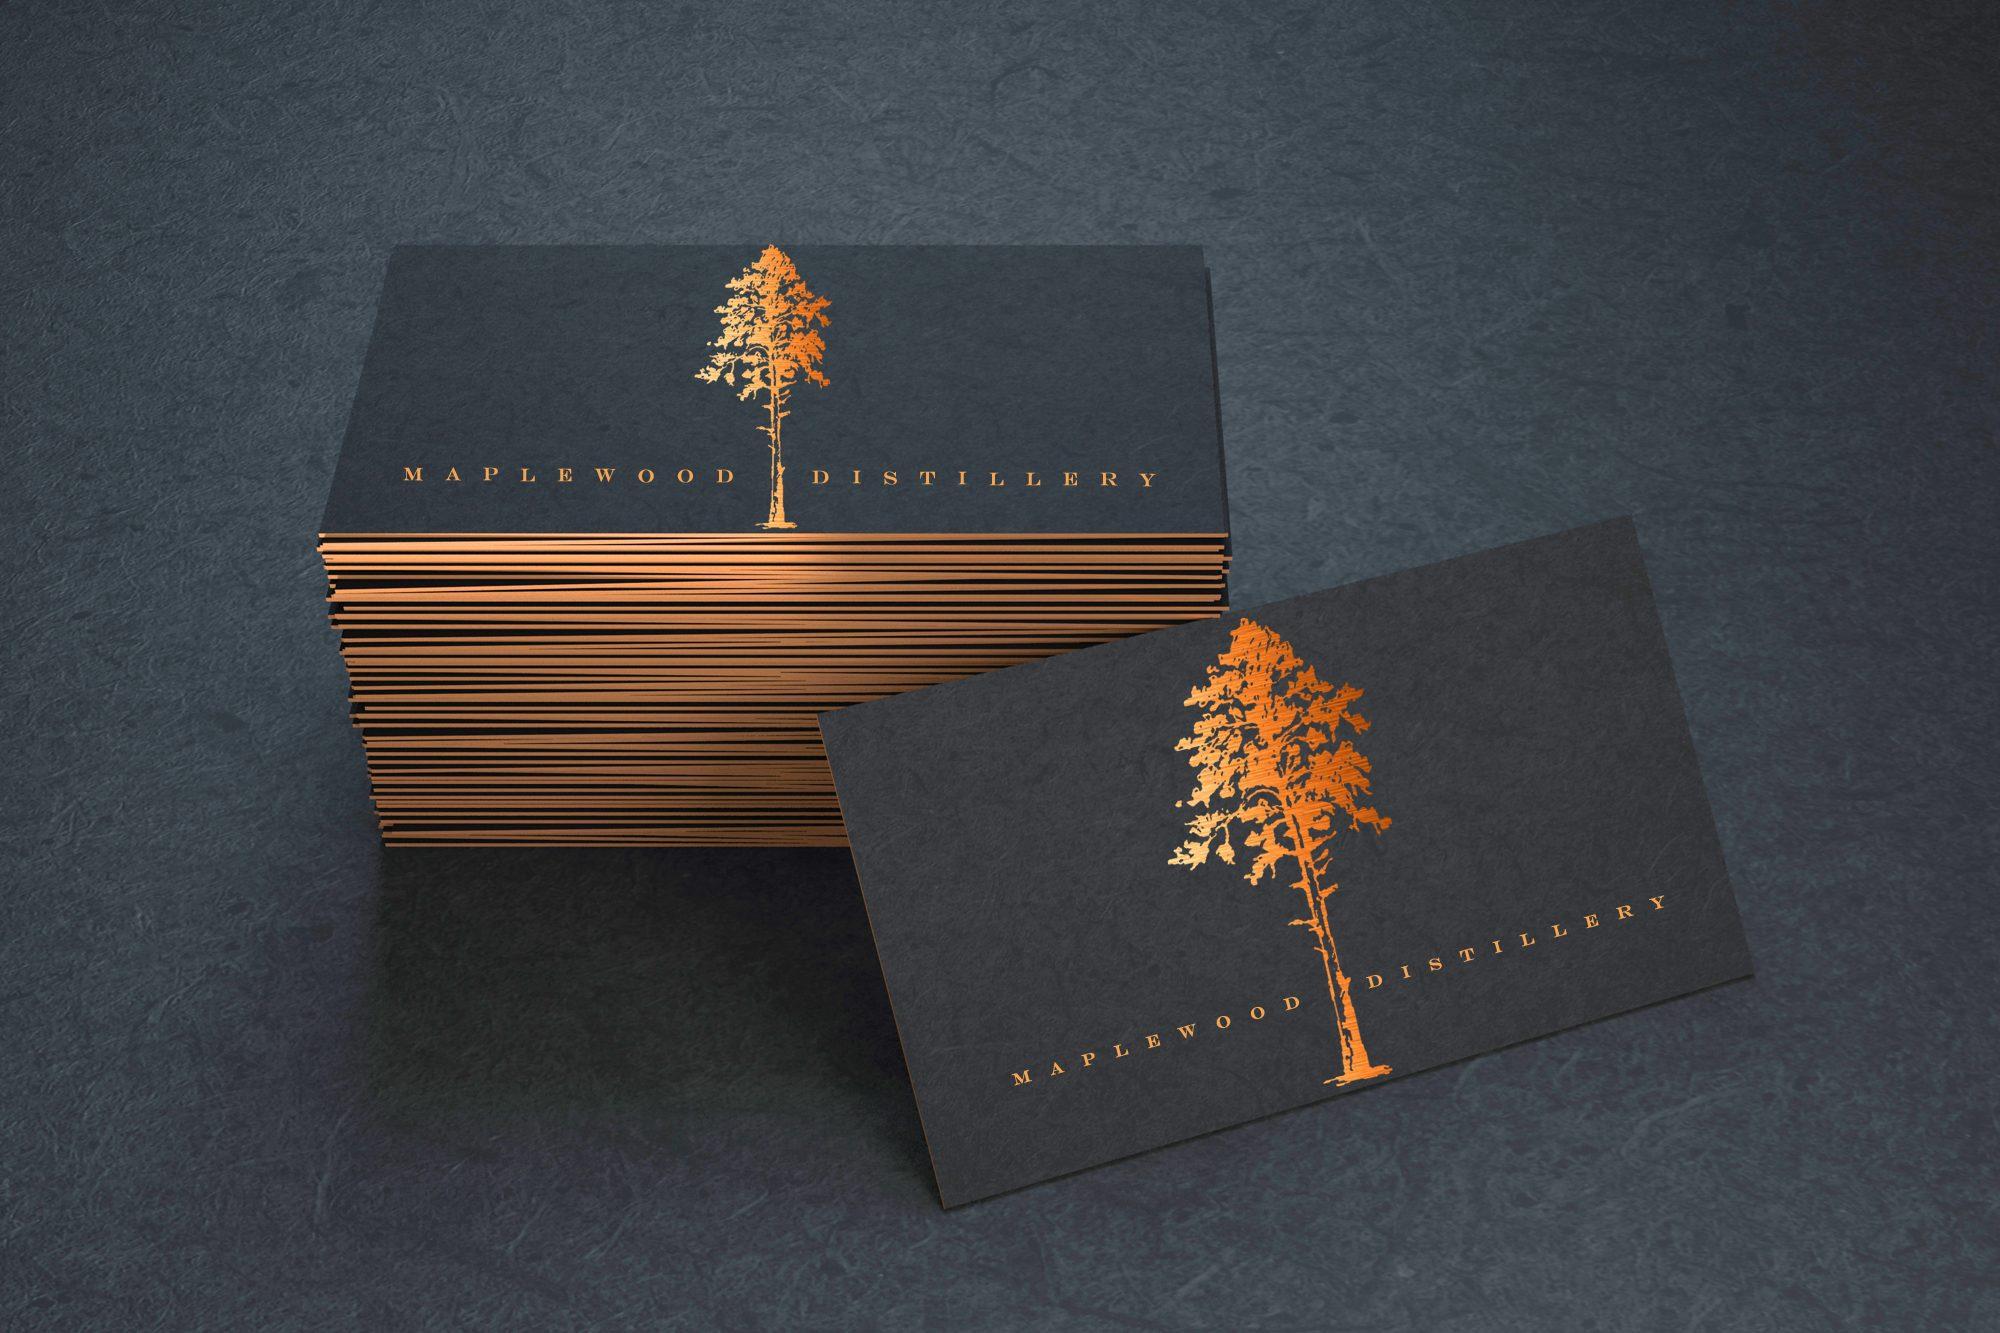 Oliver-Spence-Maplewood-Distillery-Business-Card